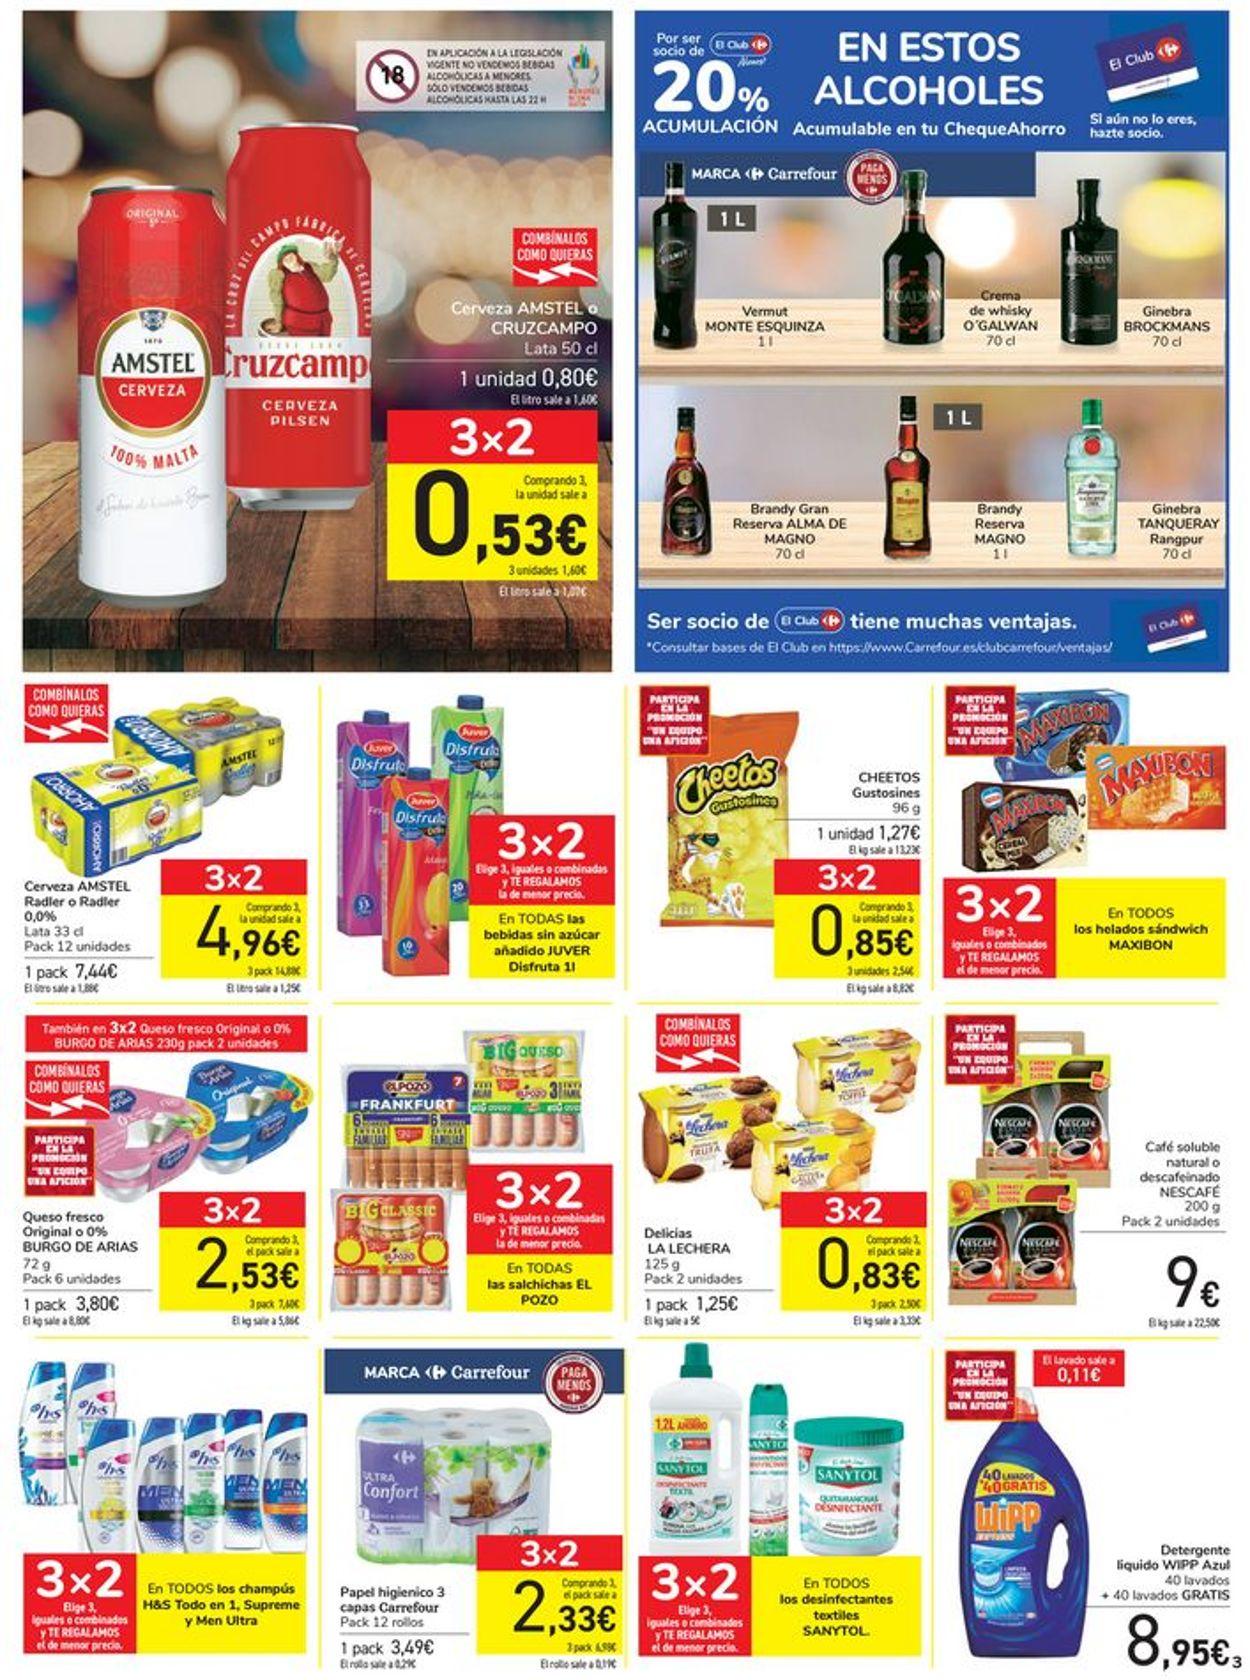 Carrefour Precios imbatibles para ayudarte Folleto - 18.05-24.05.2021 (Página 3)